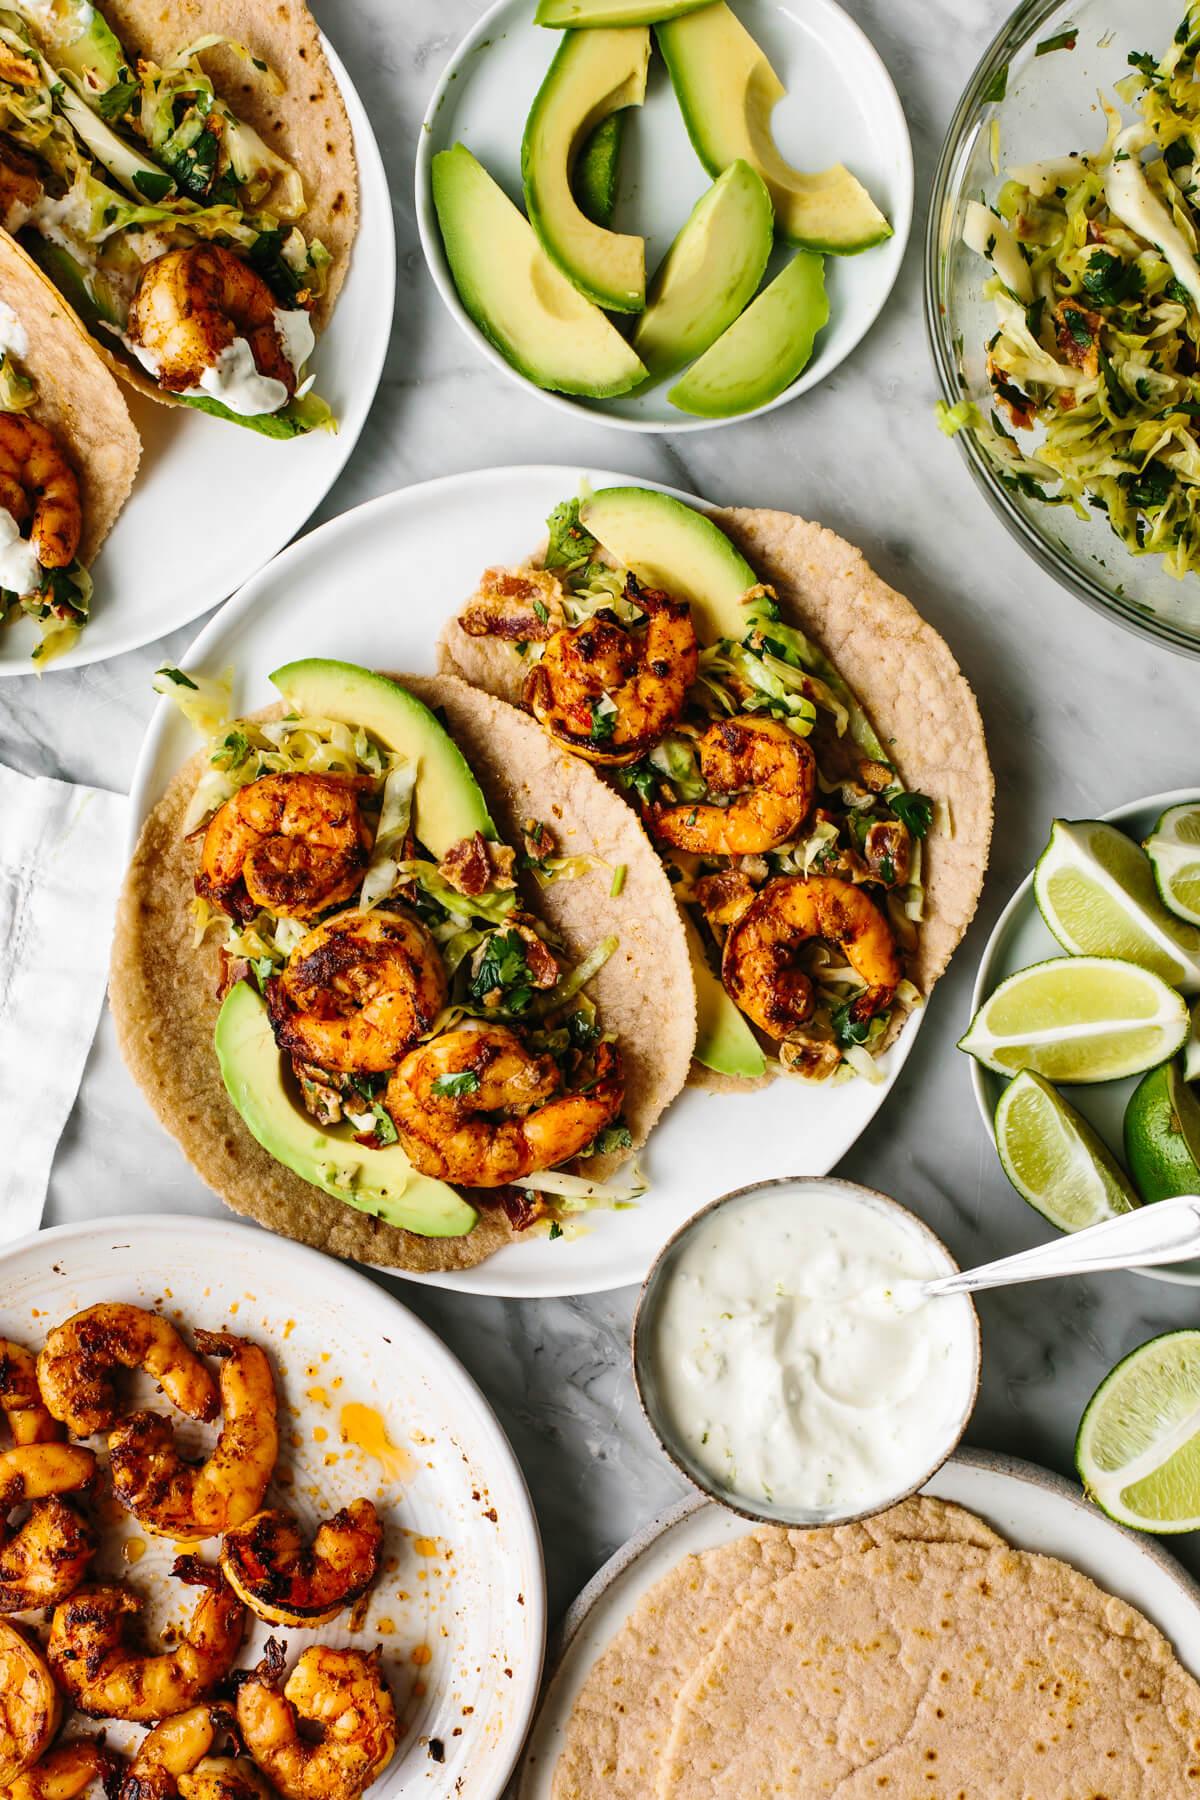 Shrimp tacos in the center of a table next to tortillas, avocado, and lime crema.